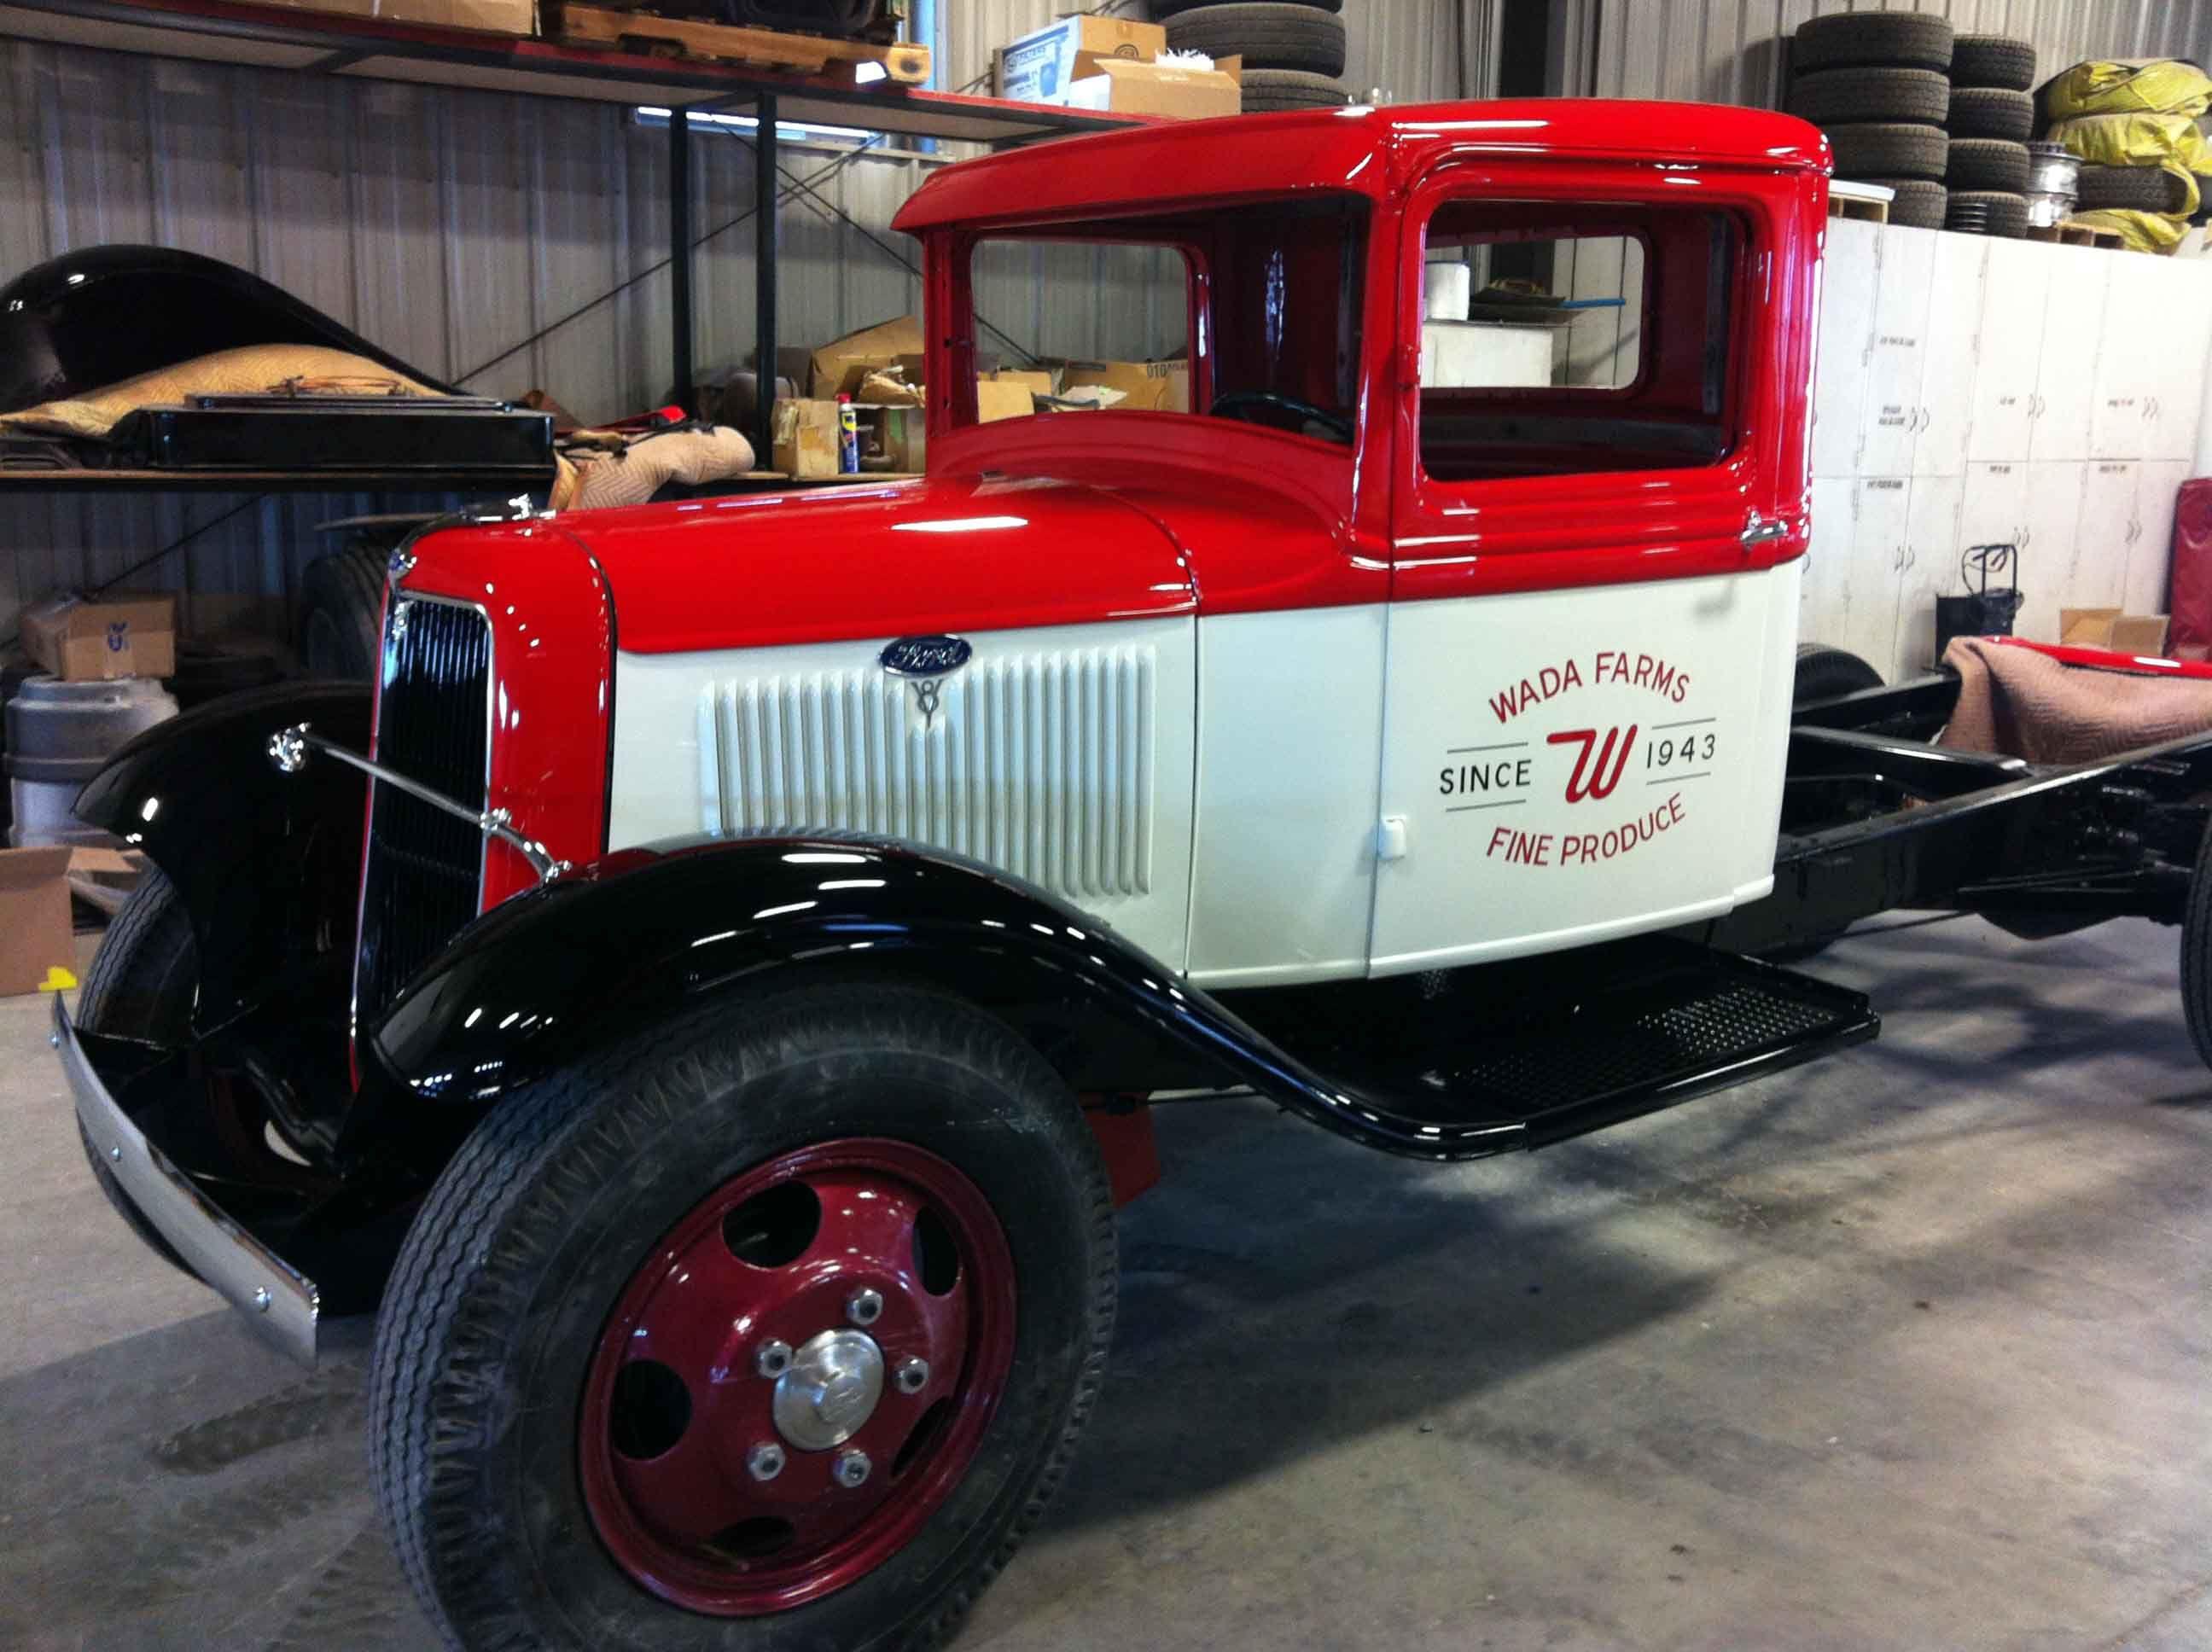 Wada Farms - Original 1934 Ford Truck | Original 1934 Ford Truck ...